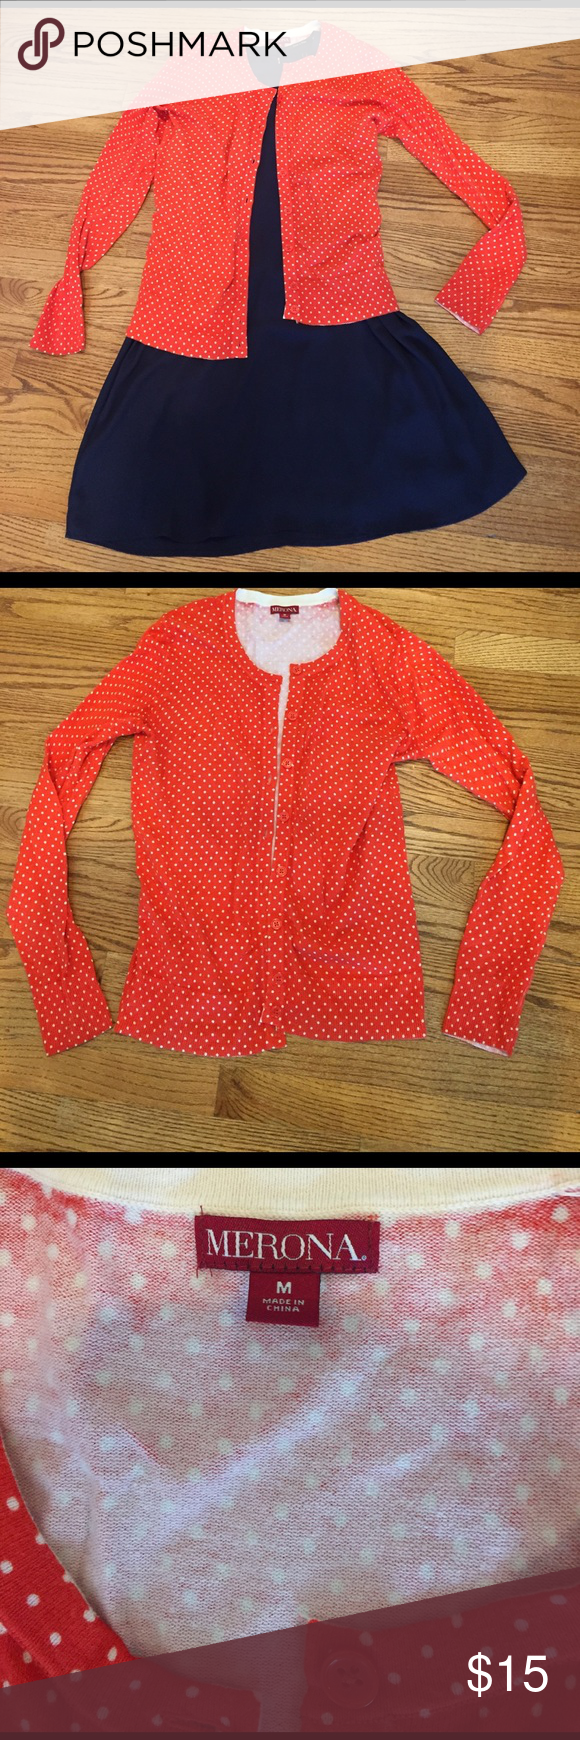 Orange and White Polka Dot Cardigan | Sweater cardigan, Polka dot ...